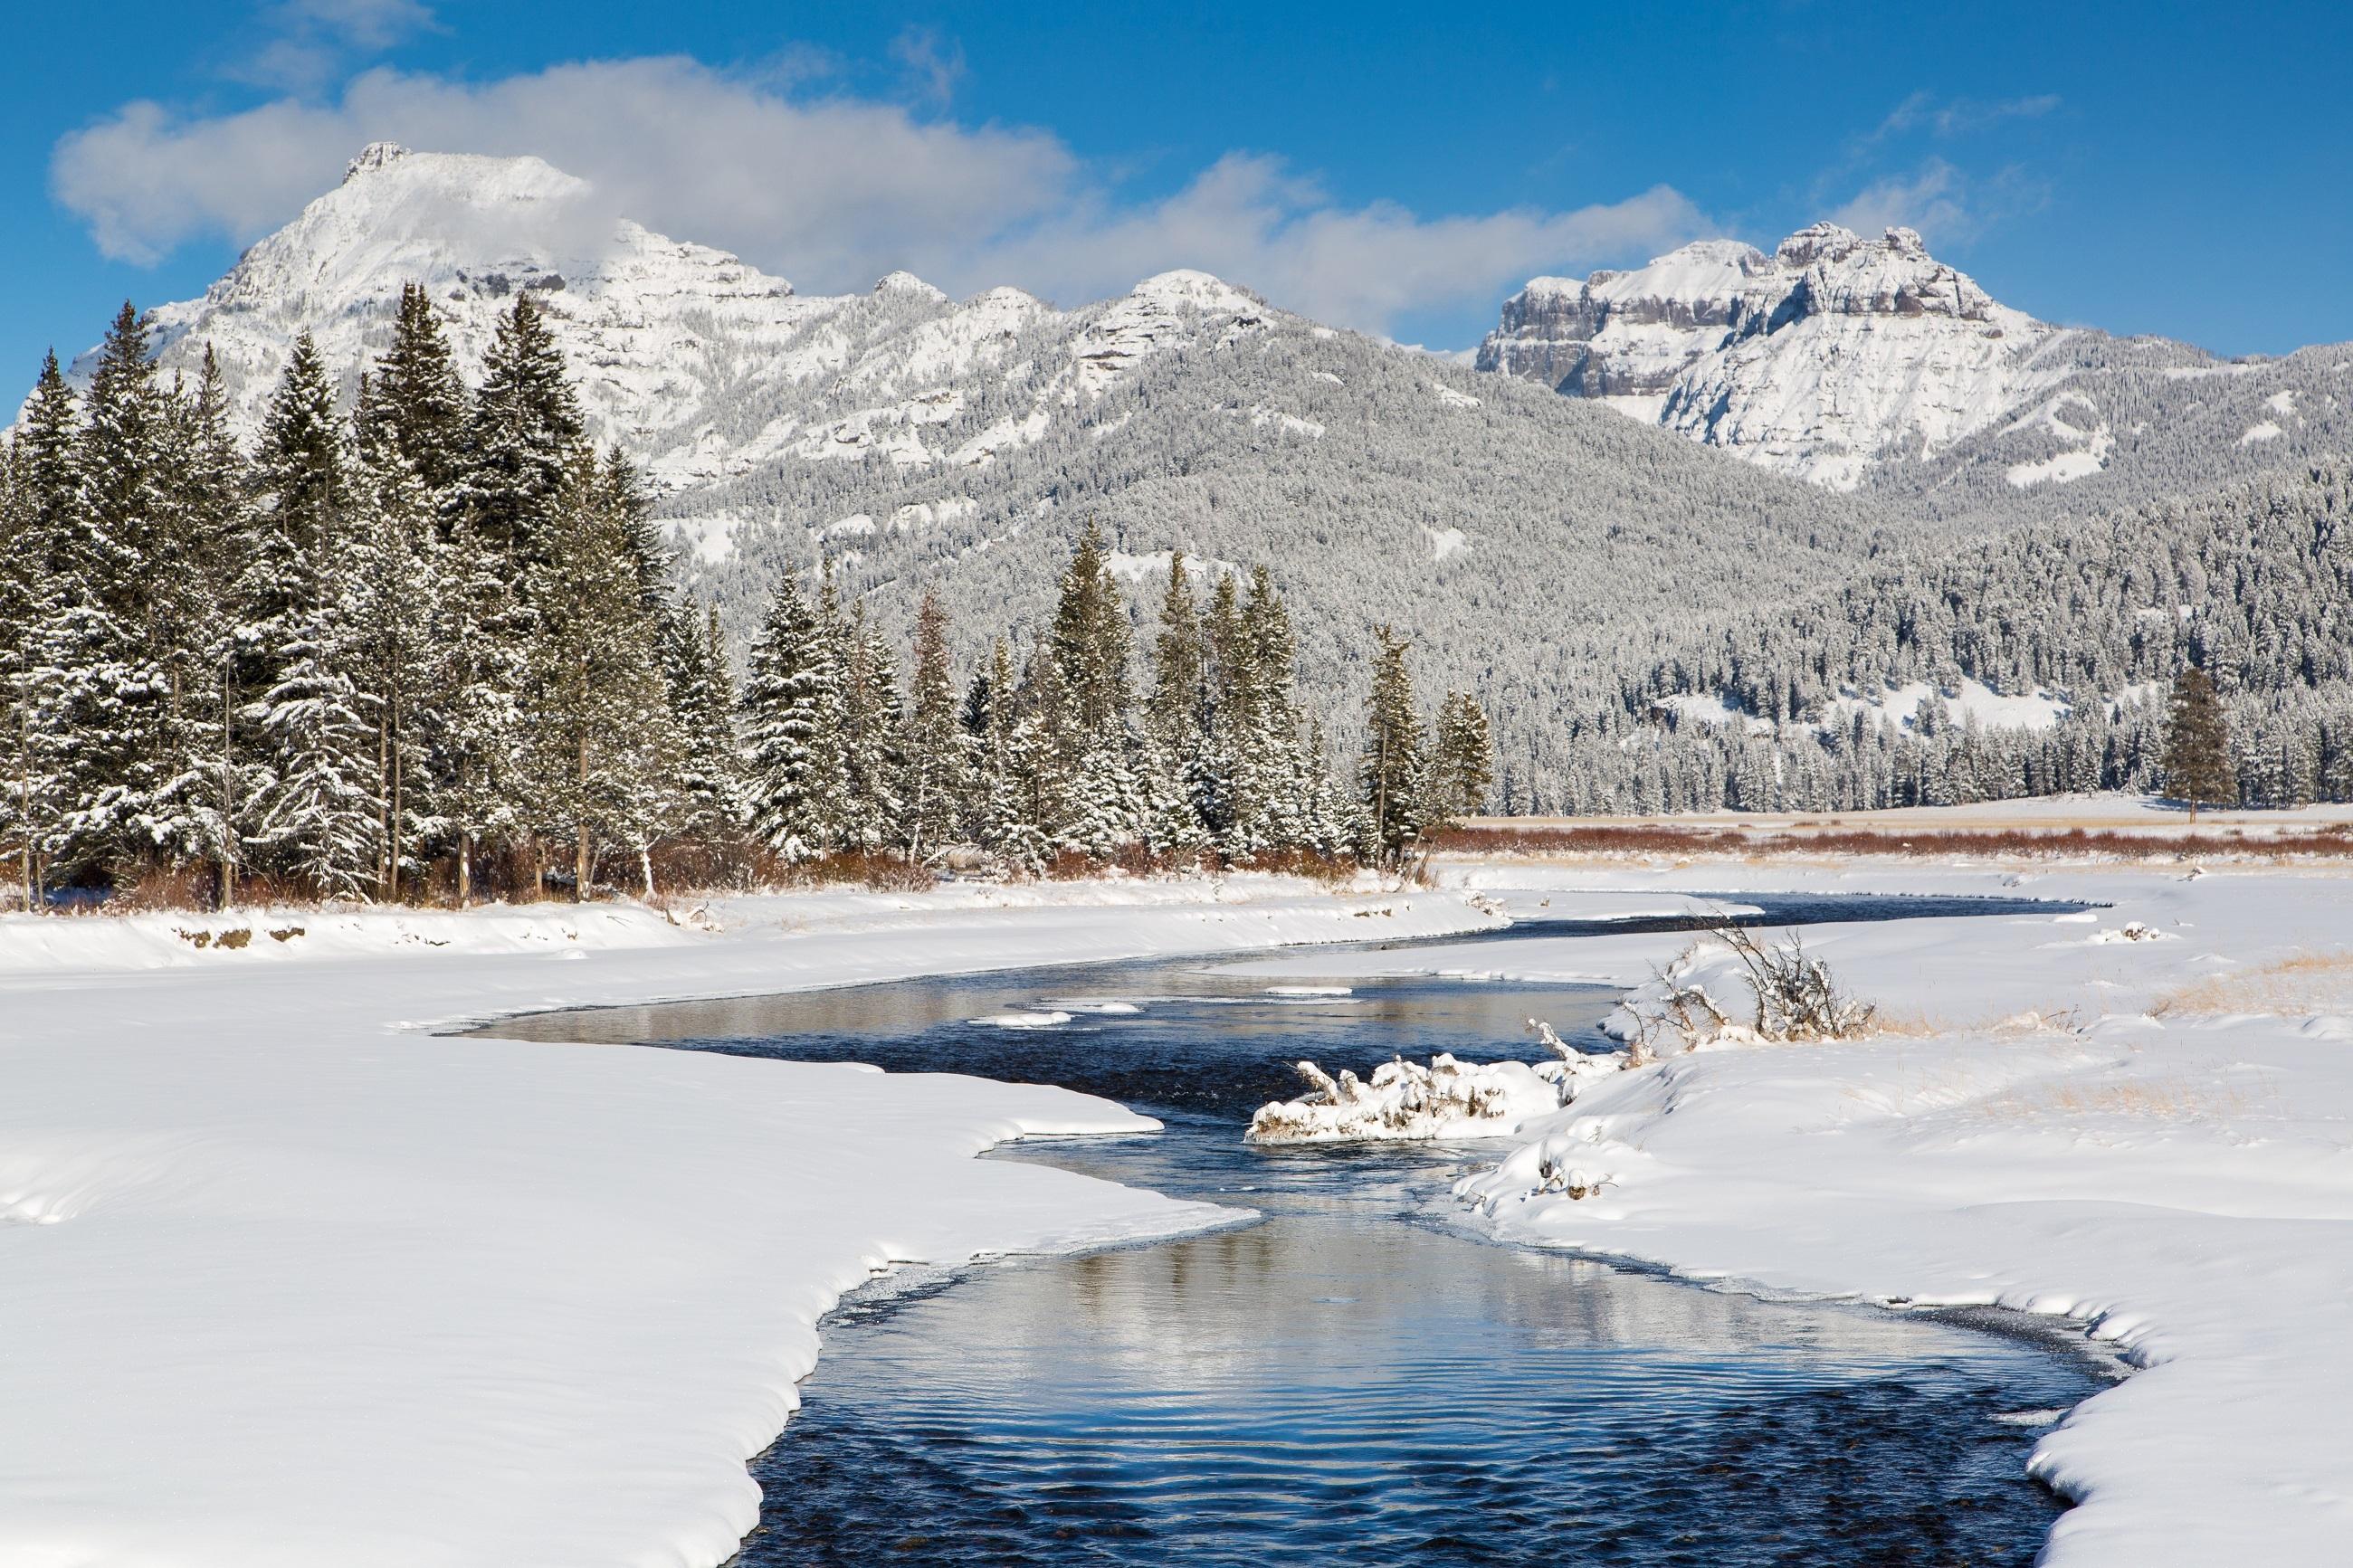 free images nature wilderness snow winter lake. Black Bedroom Furniture Sets. Home Design Ideas